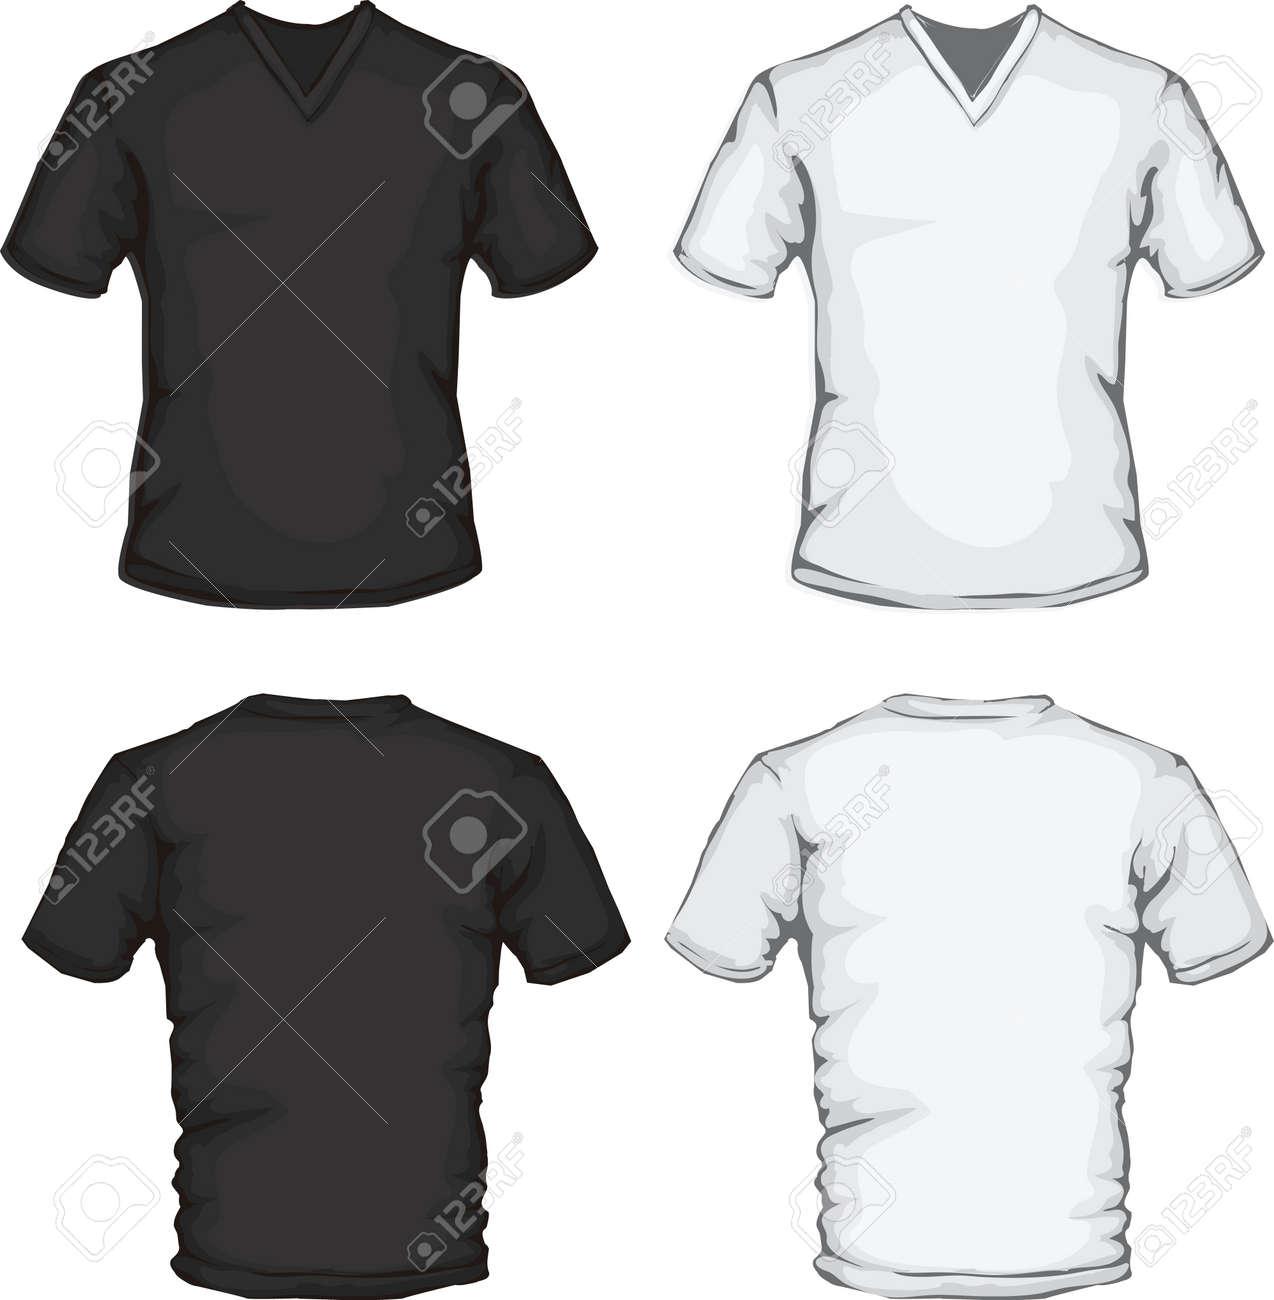 Vector Illustration Of V-neck Shirt Template In Black And White ...